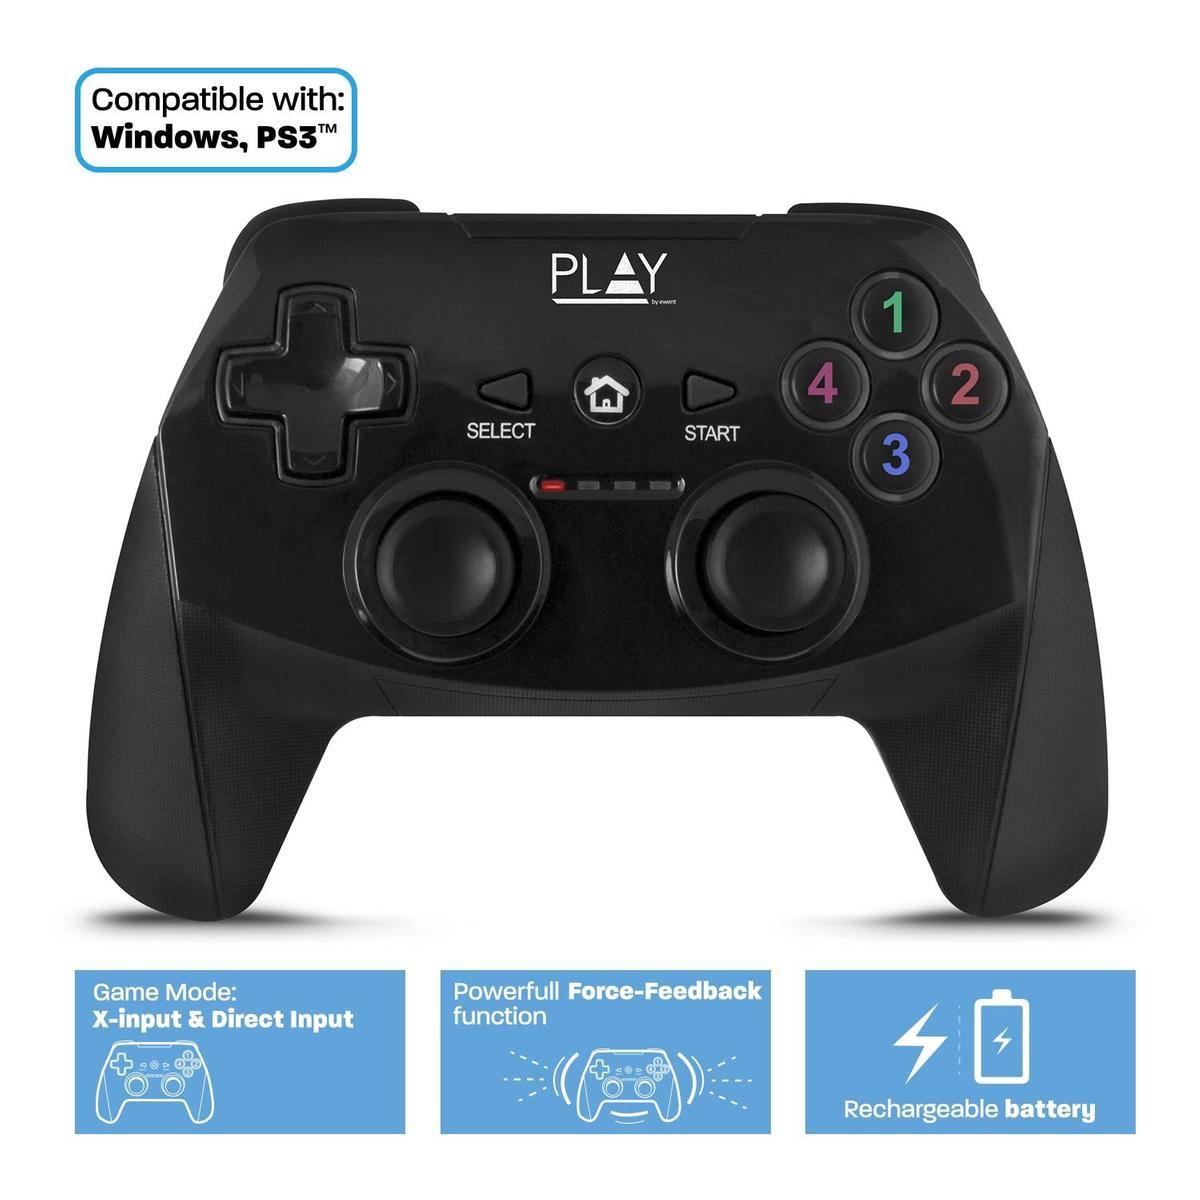 Play PL3331 game controller Gamepad PC,Playstation 3 Analoog/digitaal RF Zwart